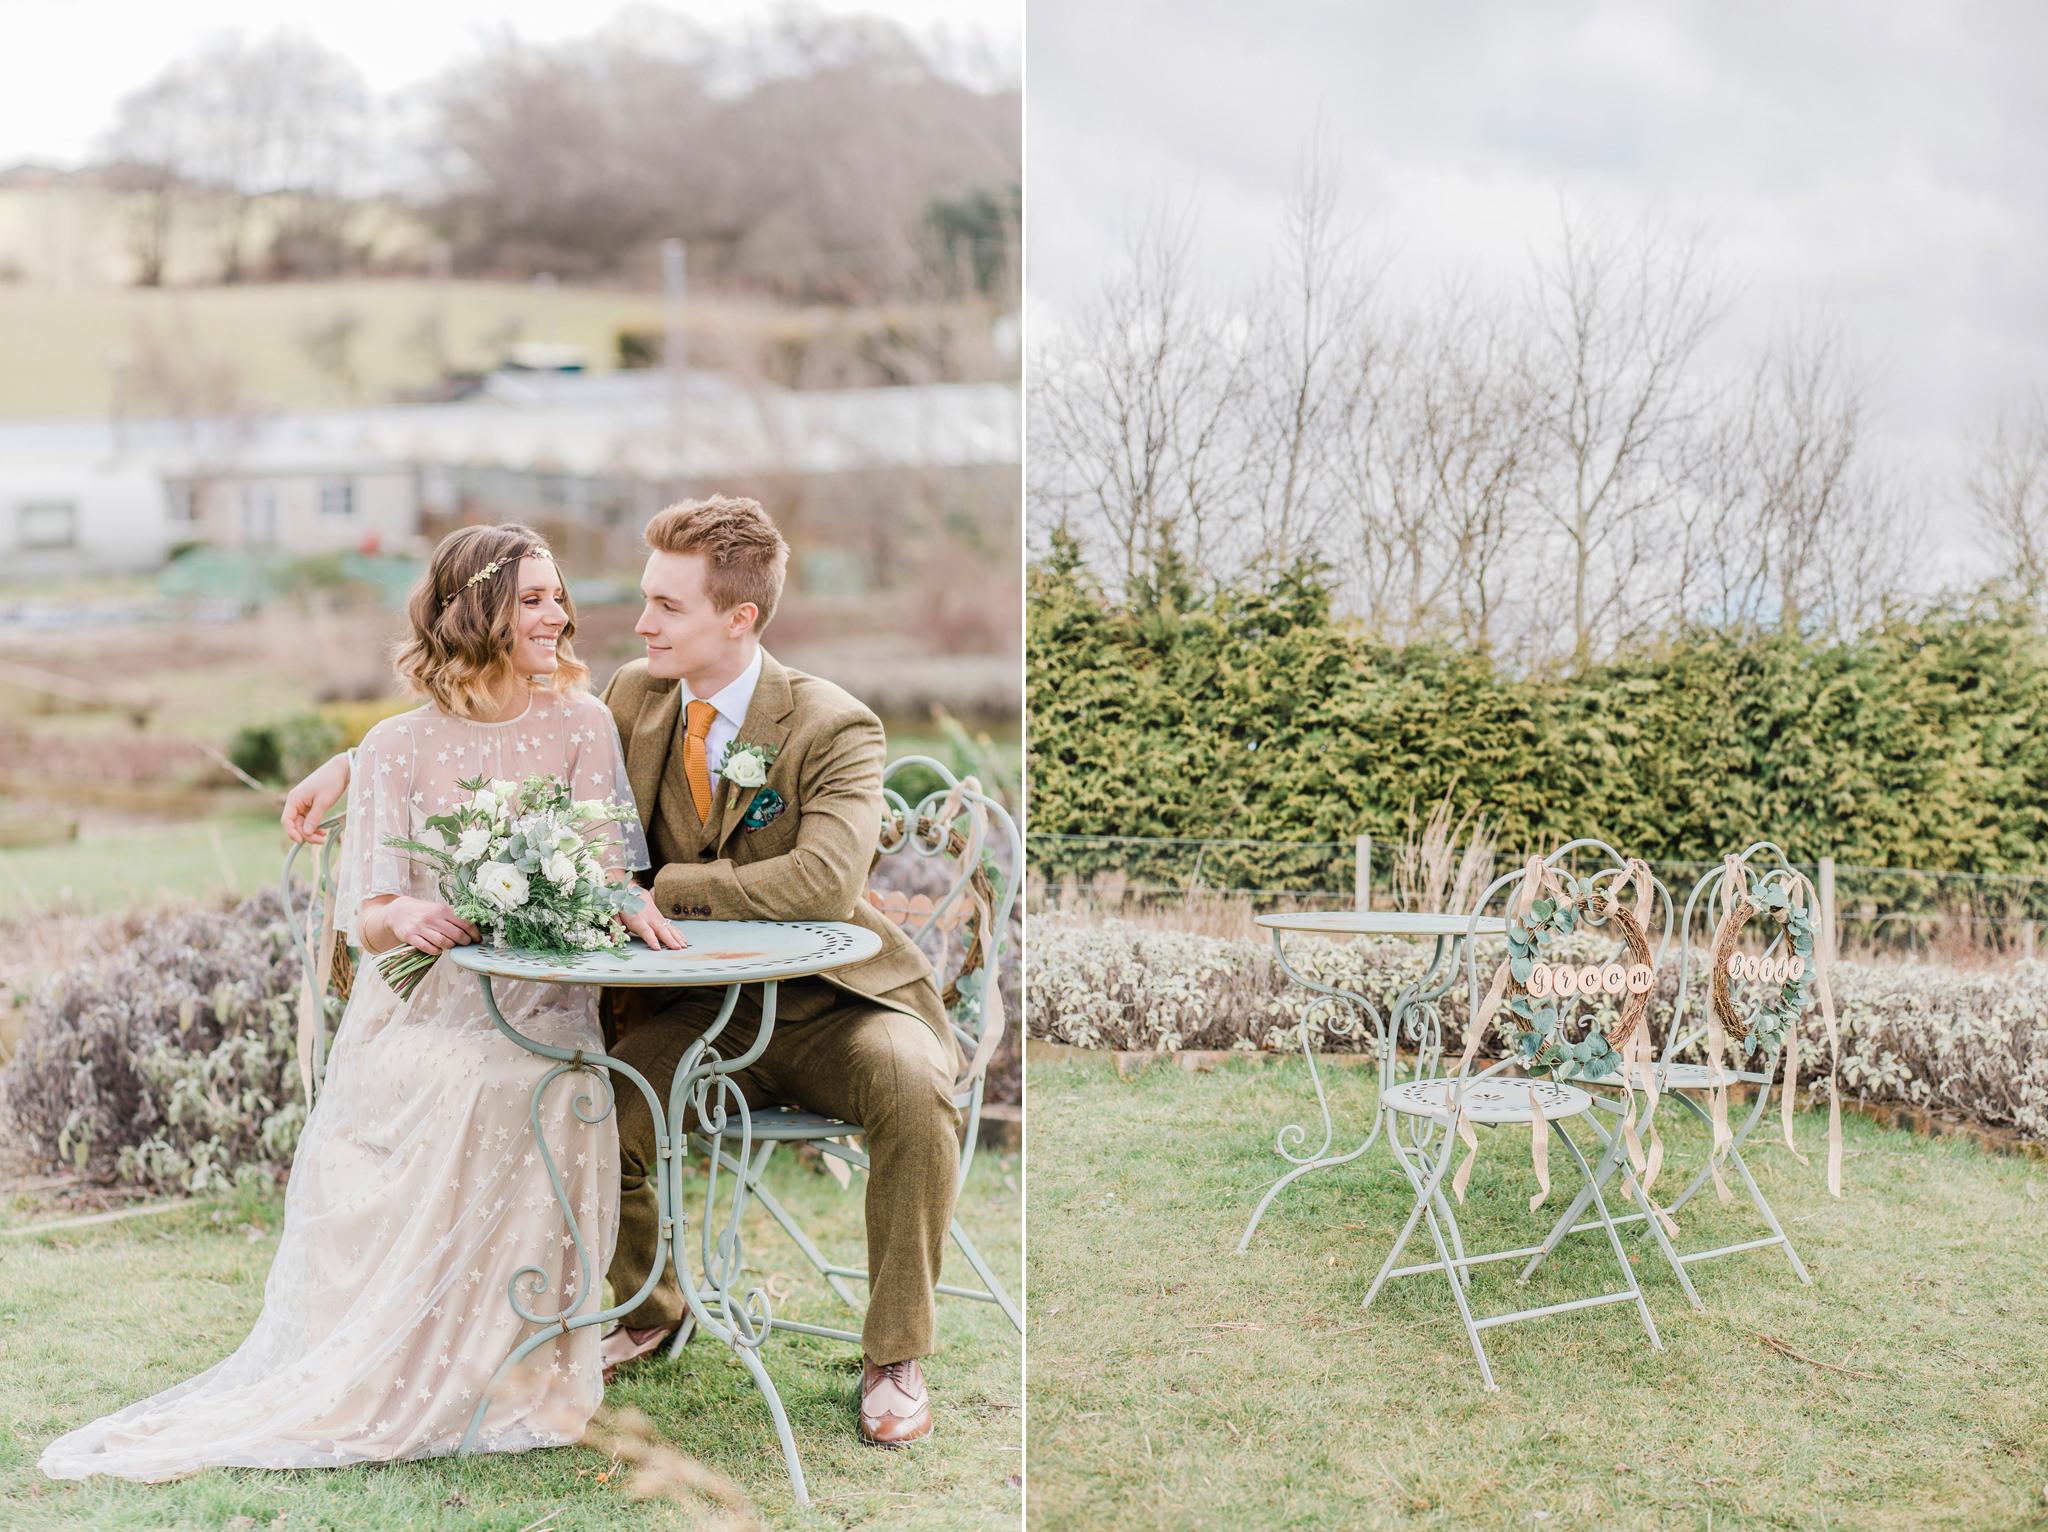 rustic-romantic-outdoor-wedding-photographer-edinburgh-07.jpg